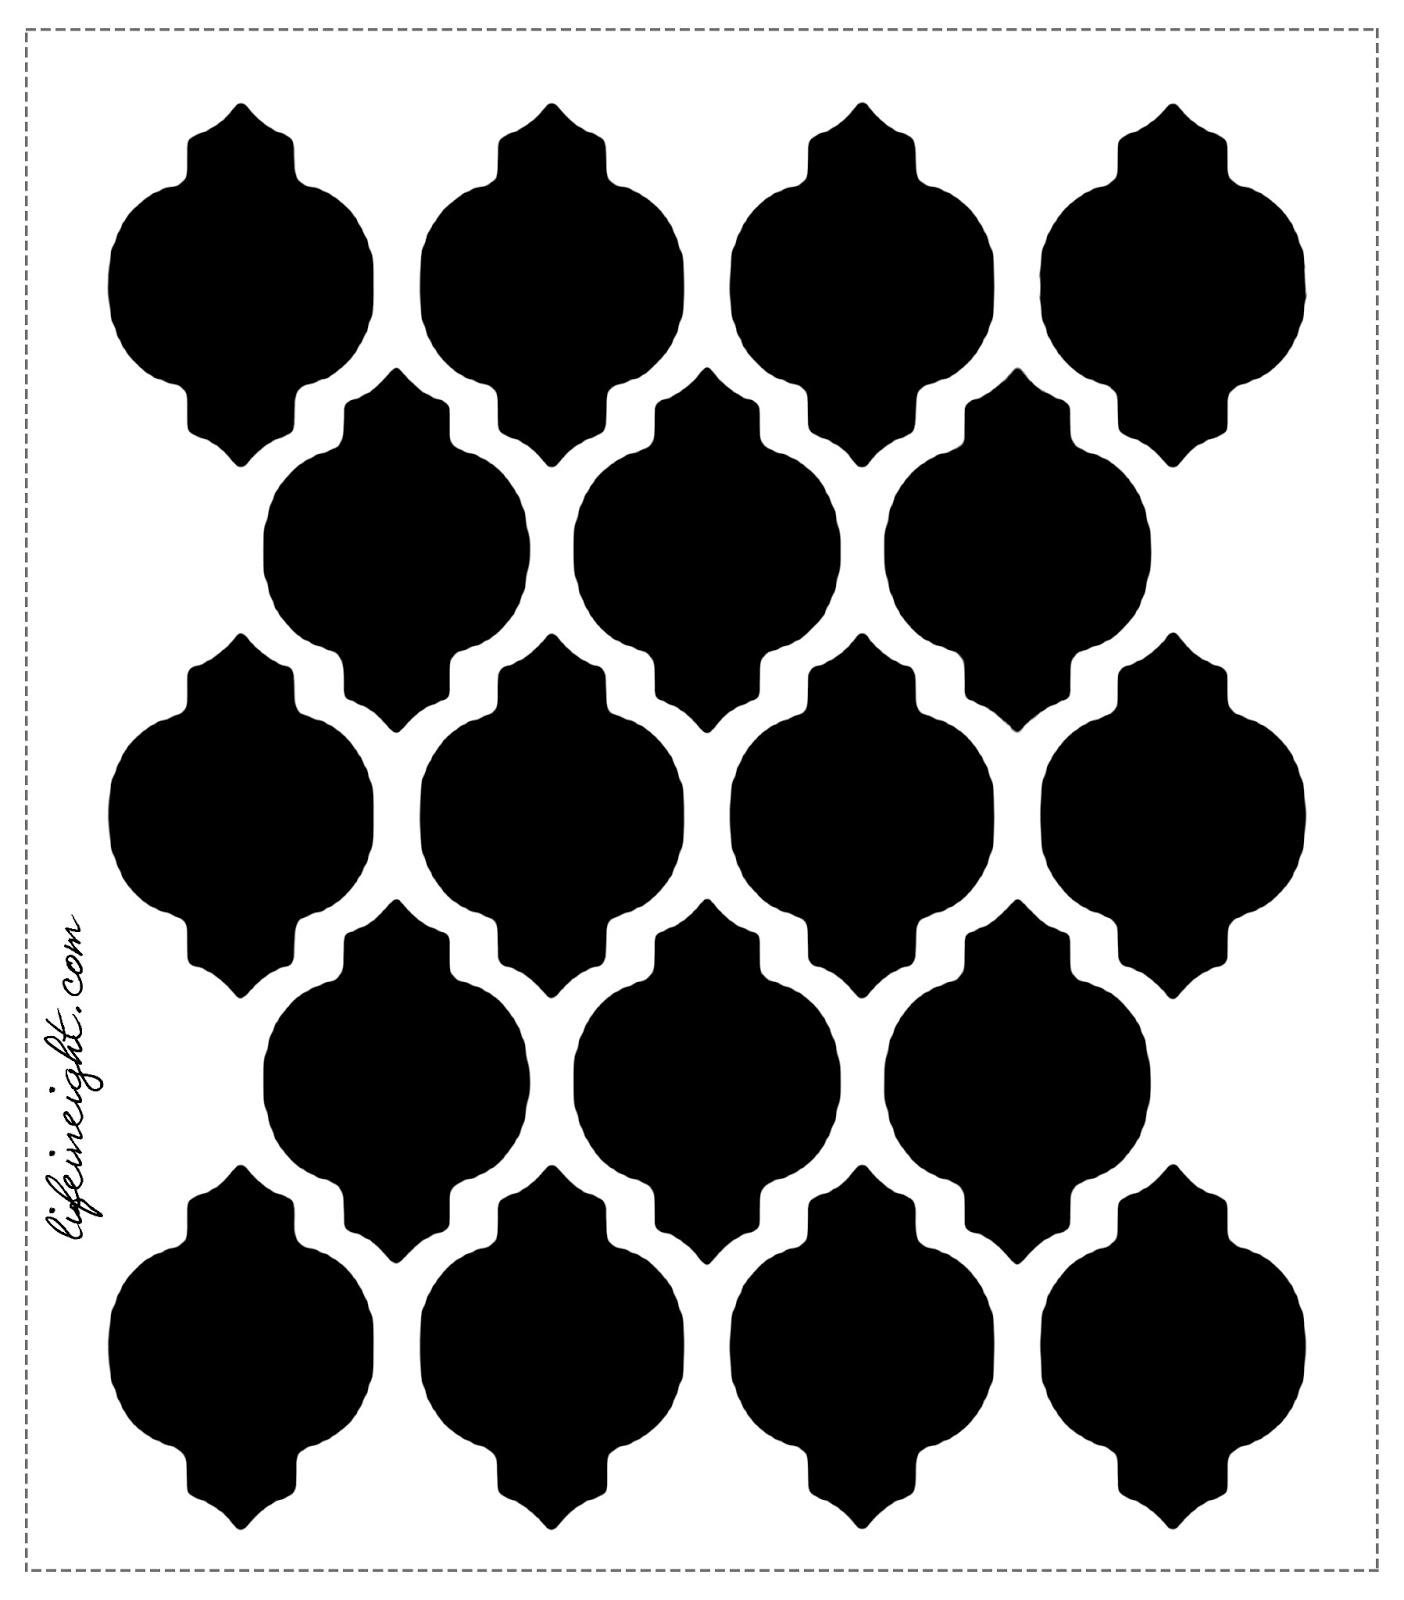 En mi Pinterest ten  237 a esto pineado   pero la idea de Gaby  la chica    Quatrefoil Pattern Stencil